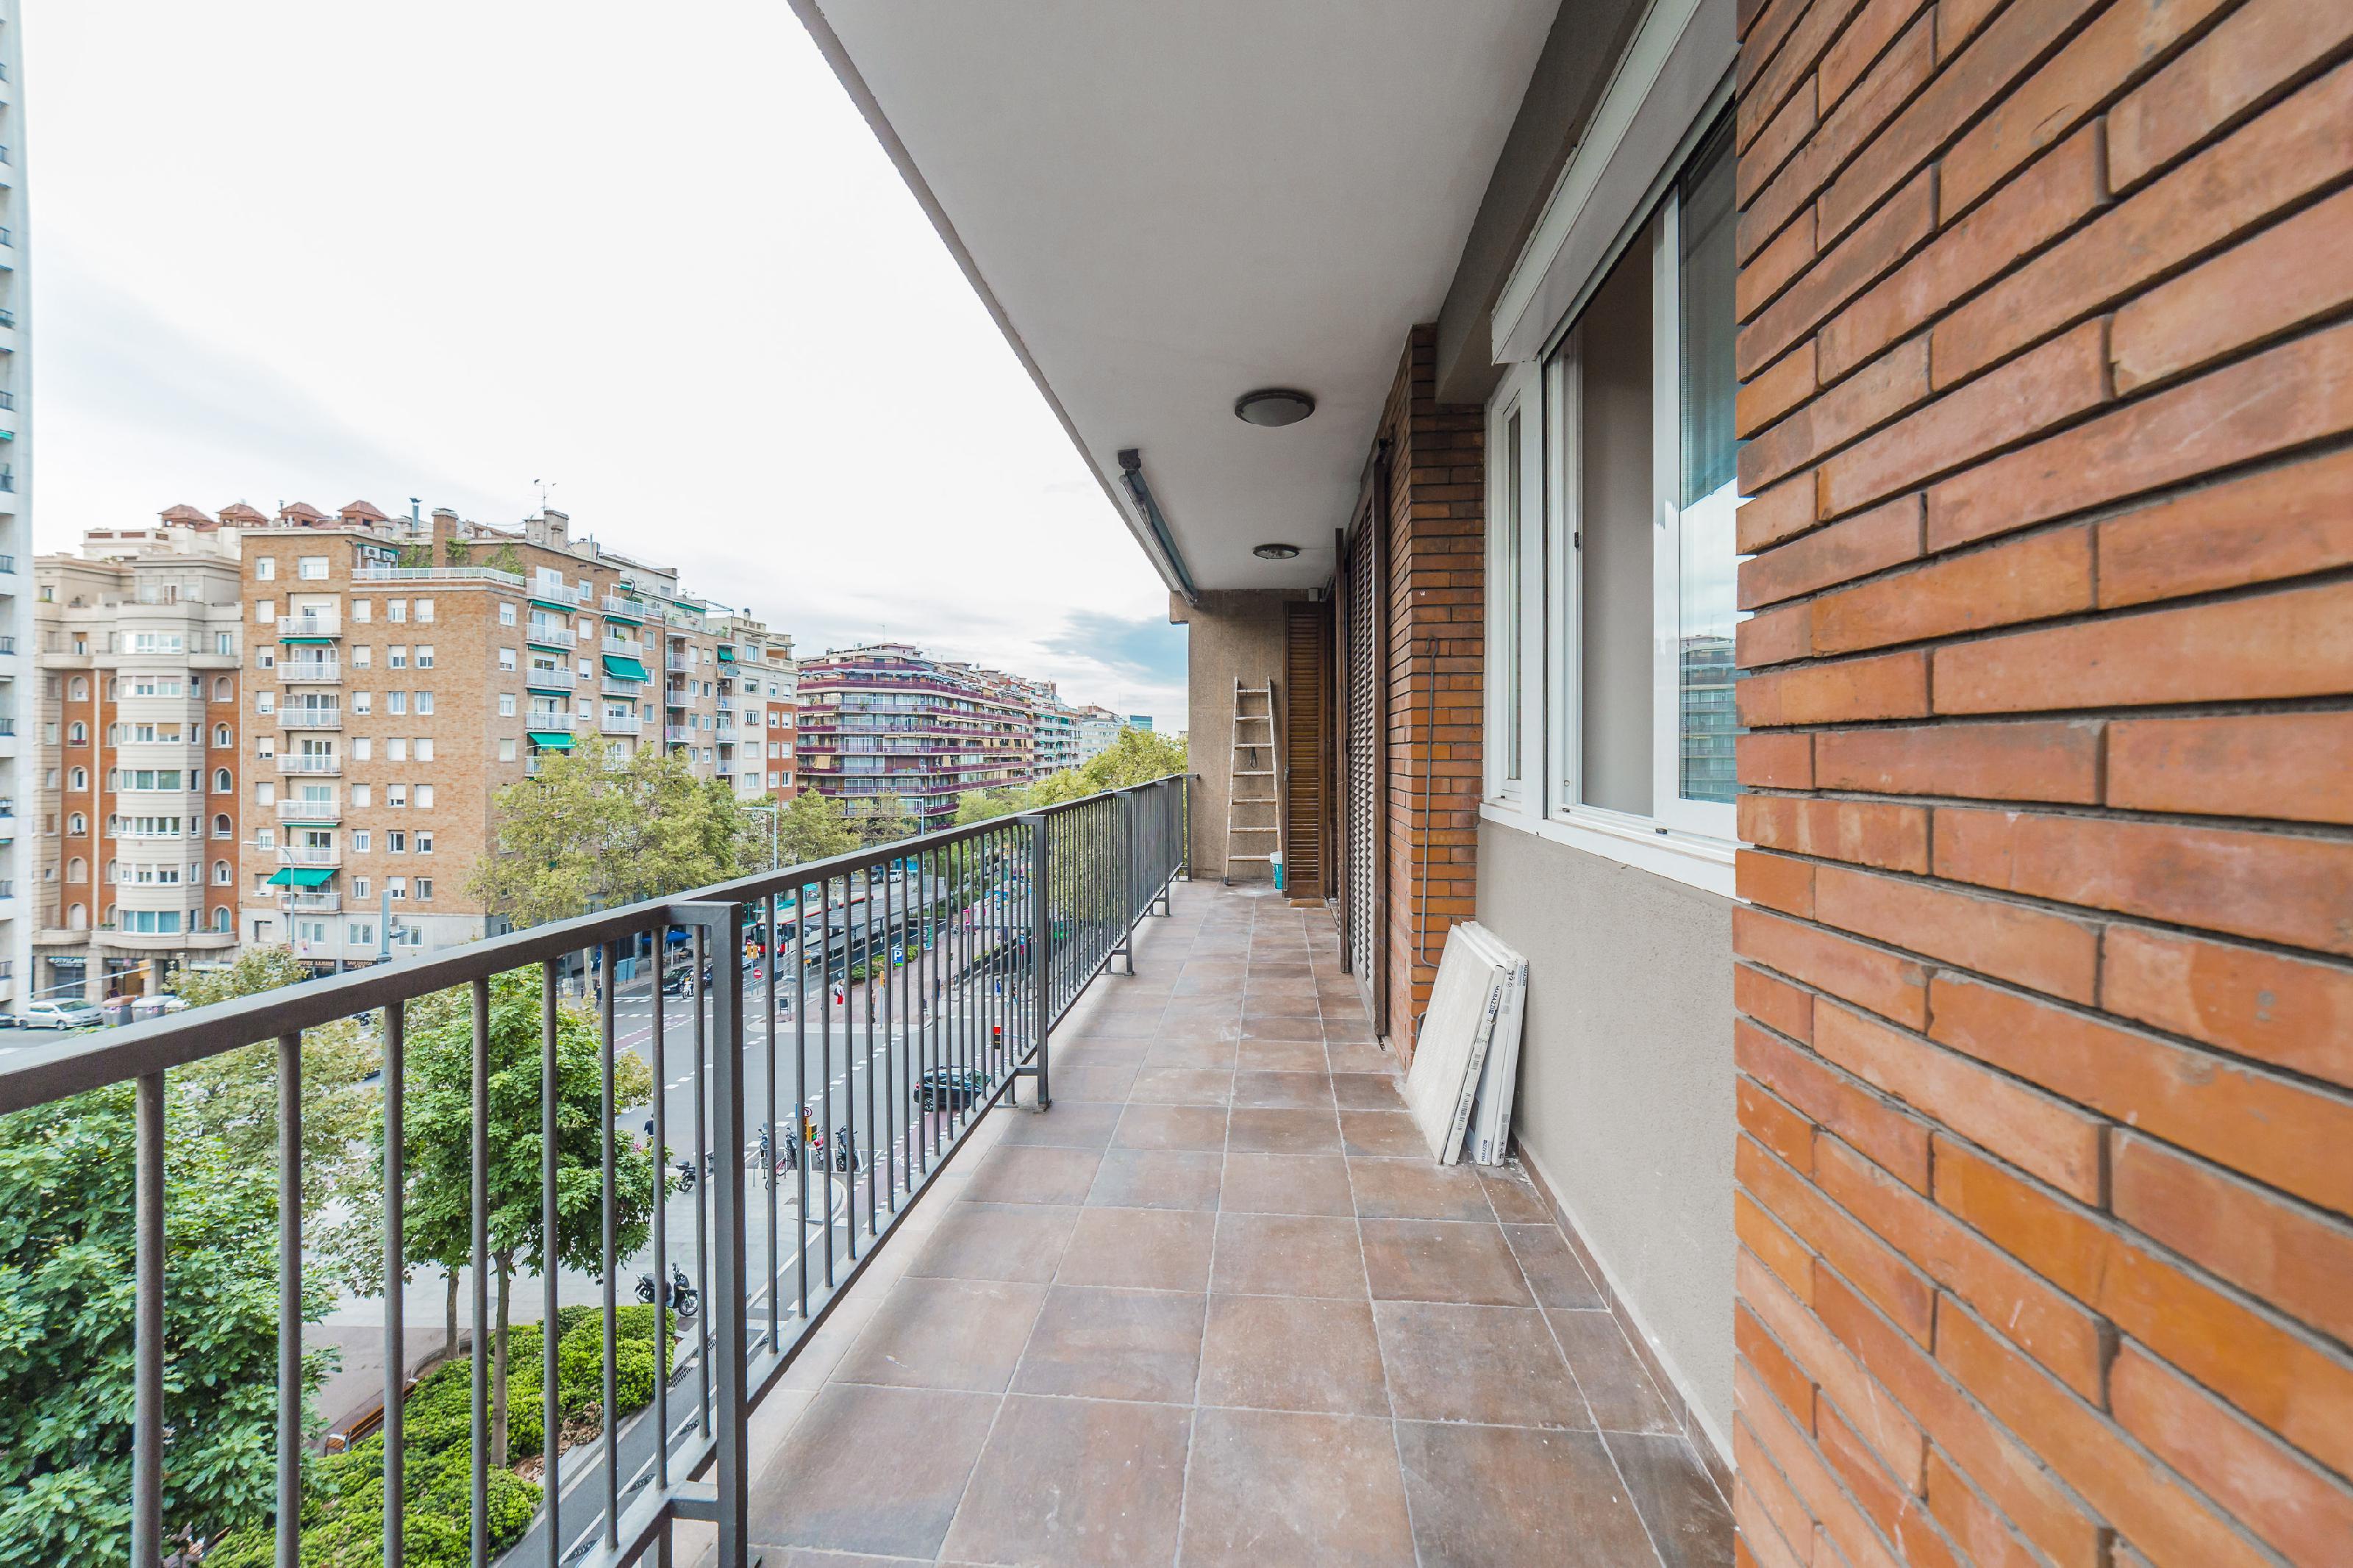 253492 Flat for sale in Sarrià-Sant Gervasi, Sant Gervasi-Galvany 21